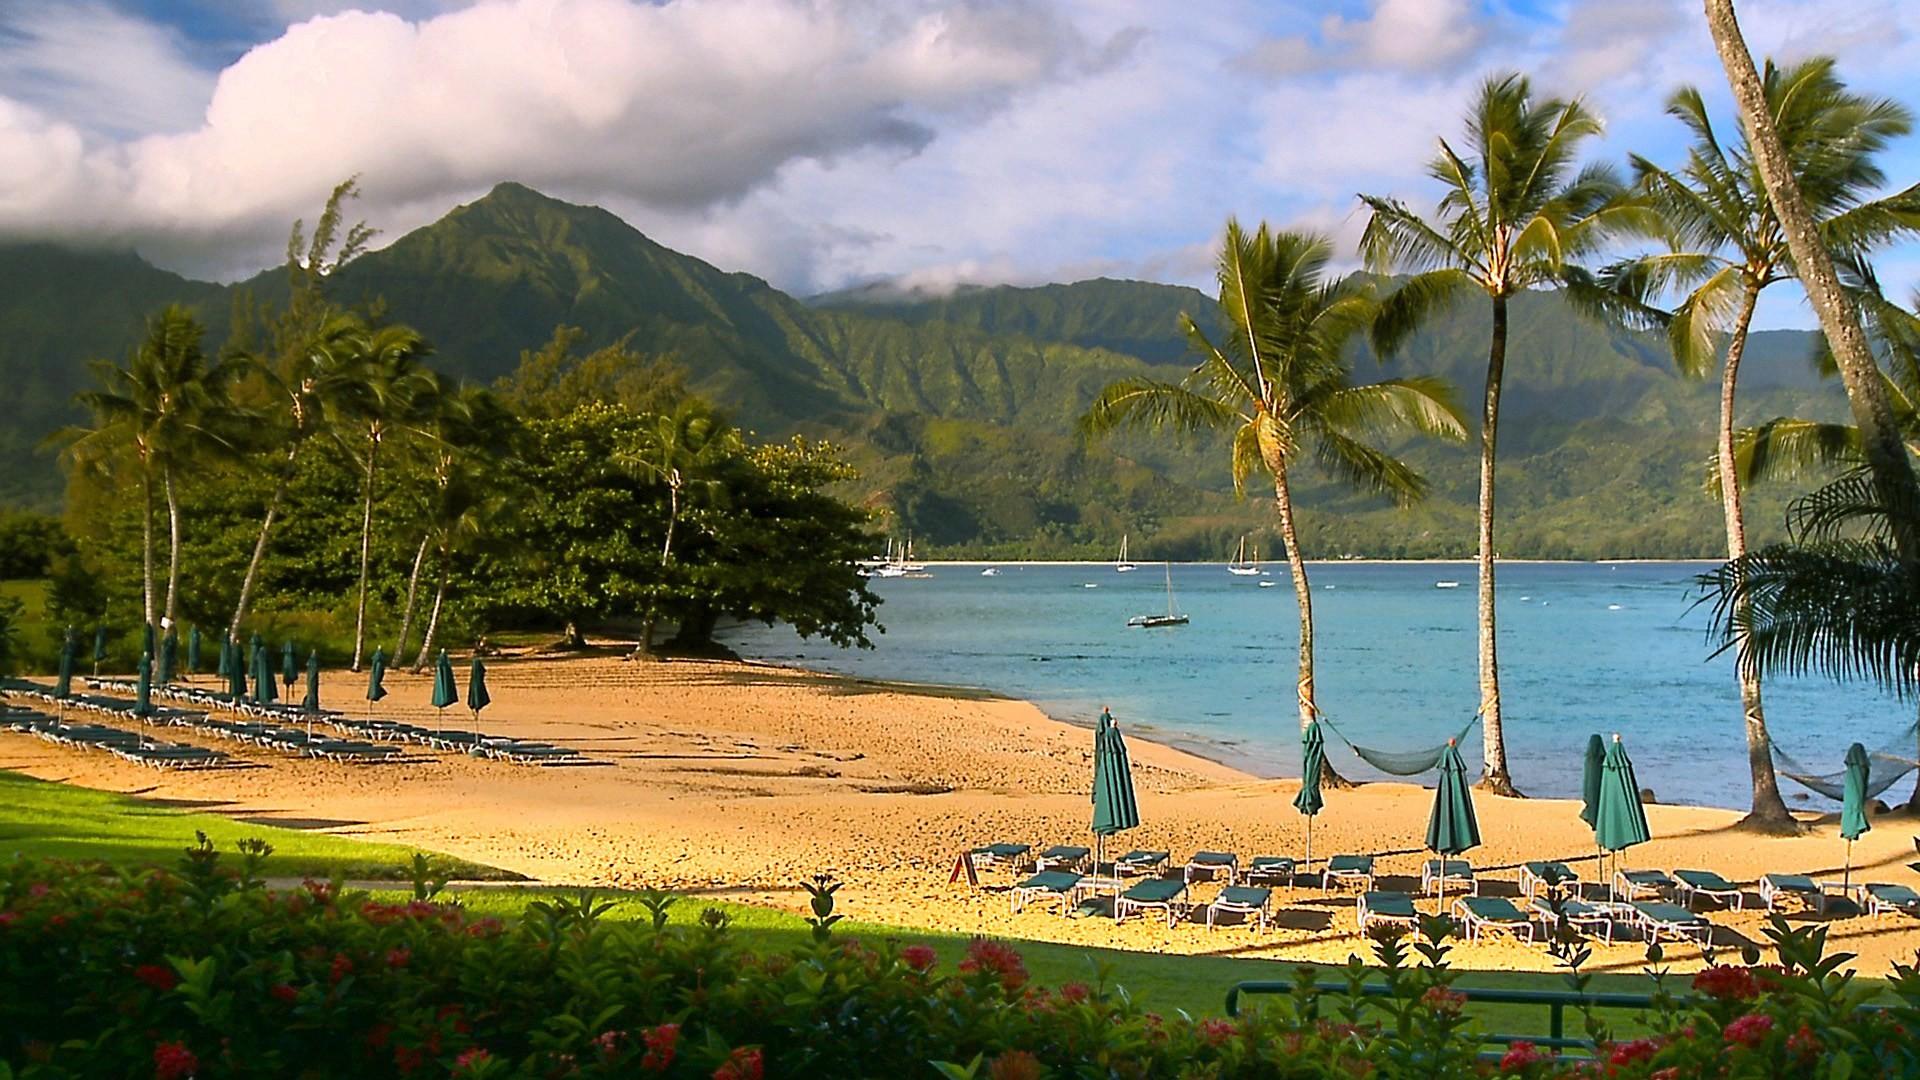 Hawaii Nature Background Beach Beaches Media Webshots Beautiful Hd